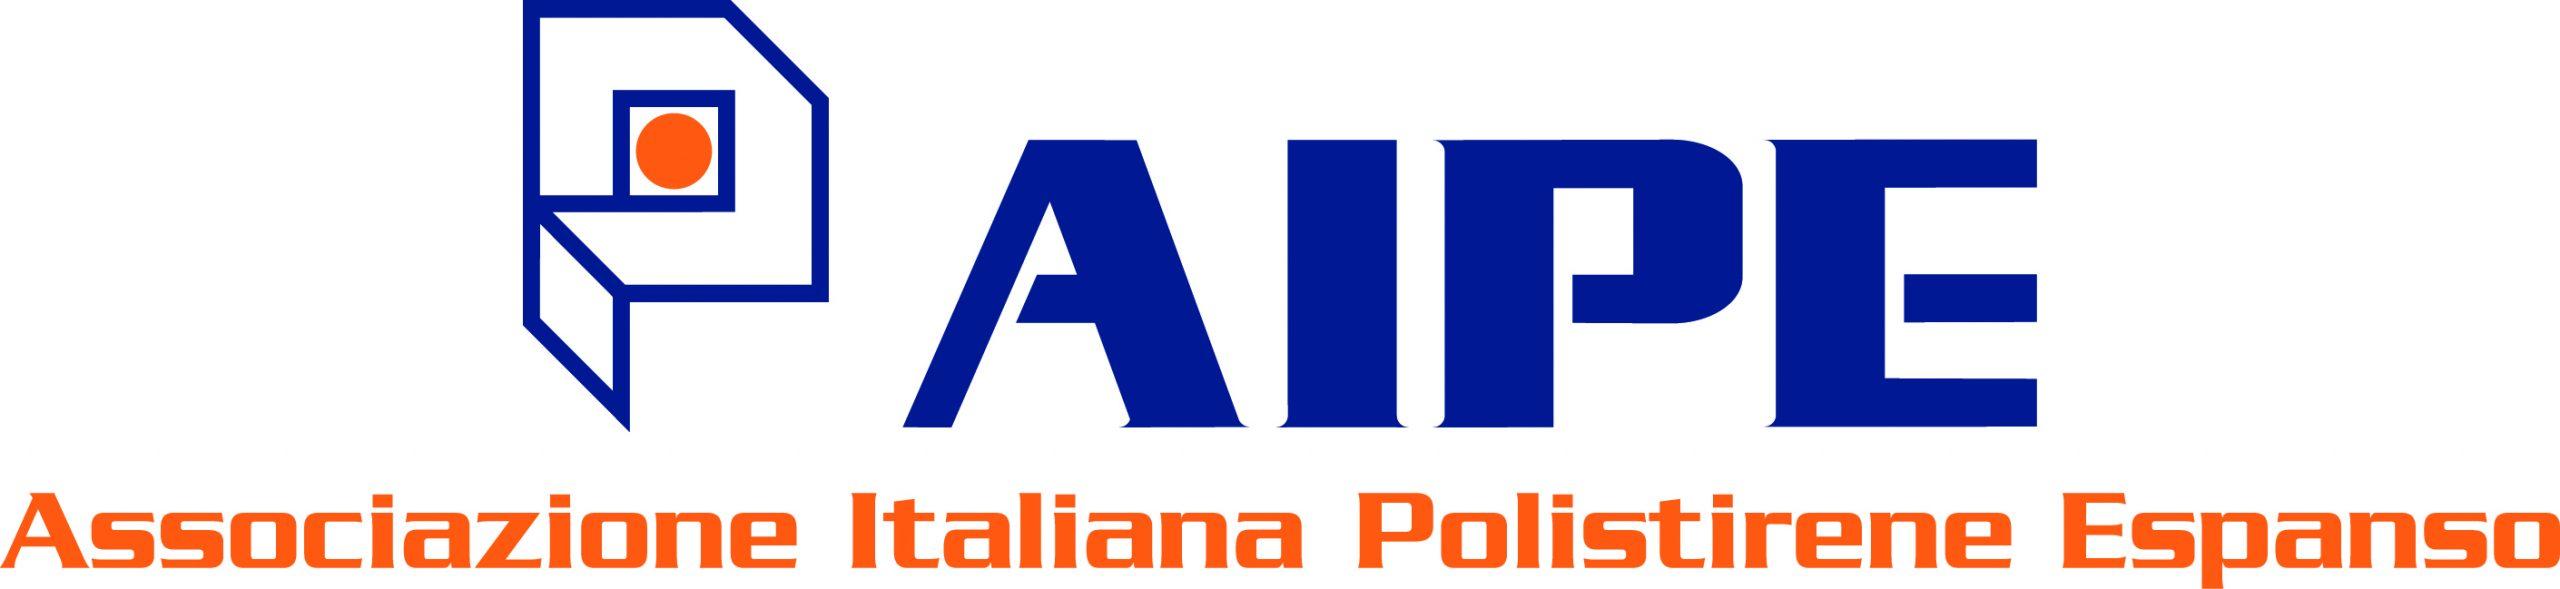 AIPE- Associazione Italiana Polistirene Espanso